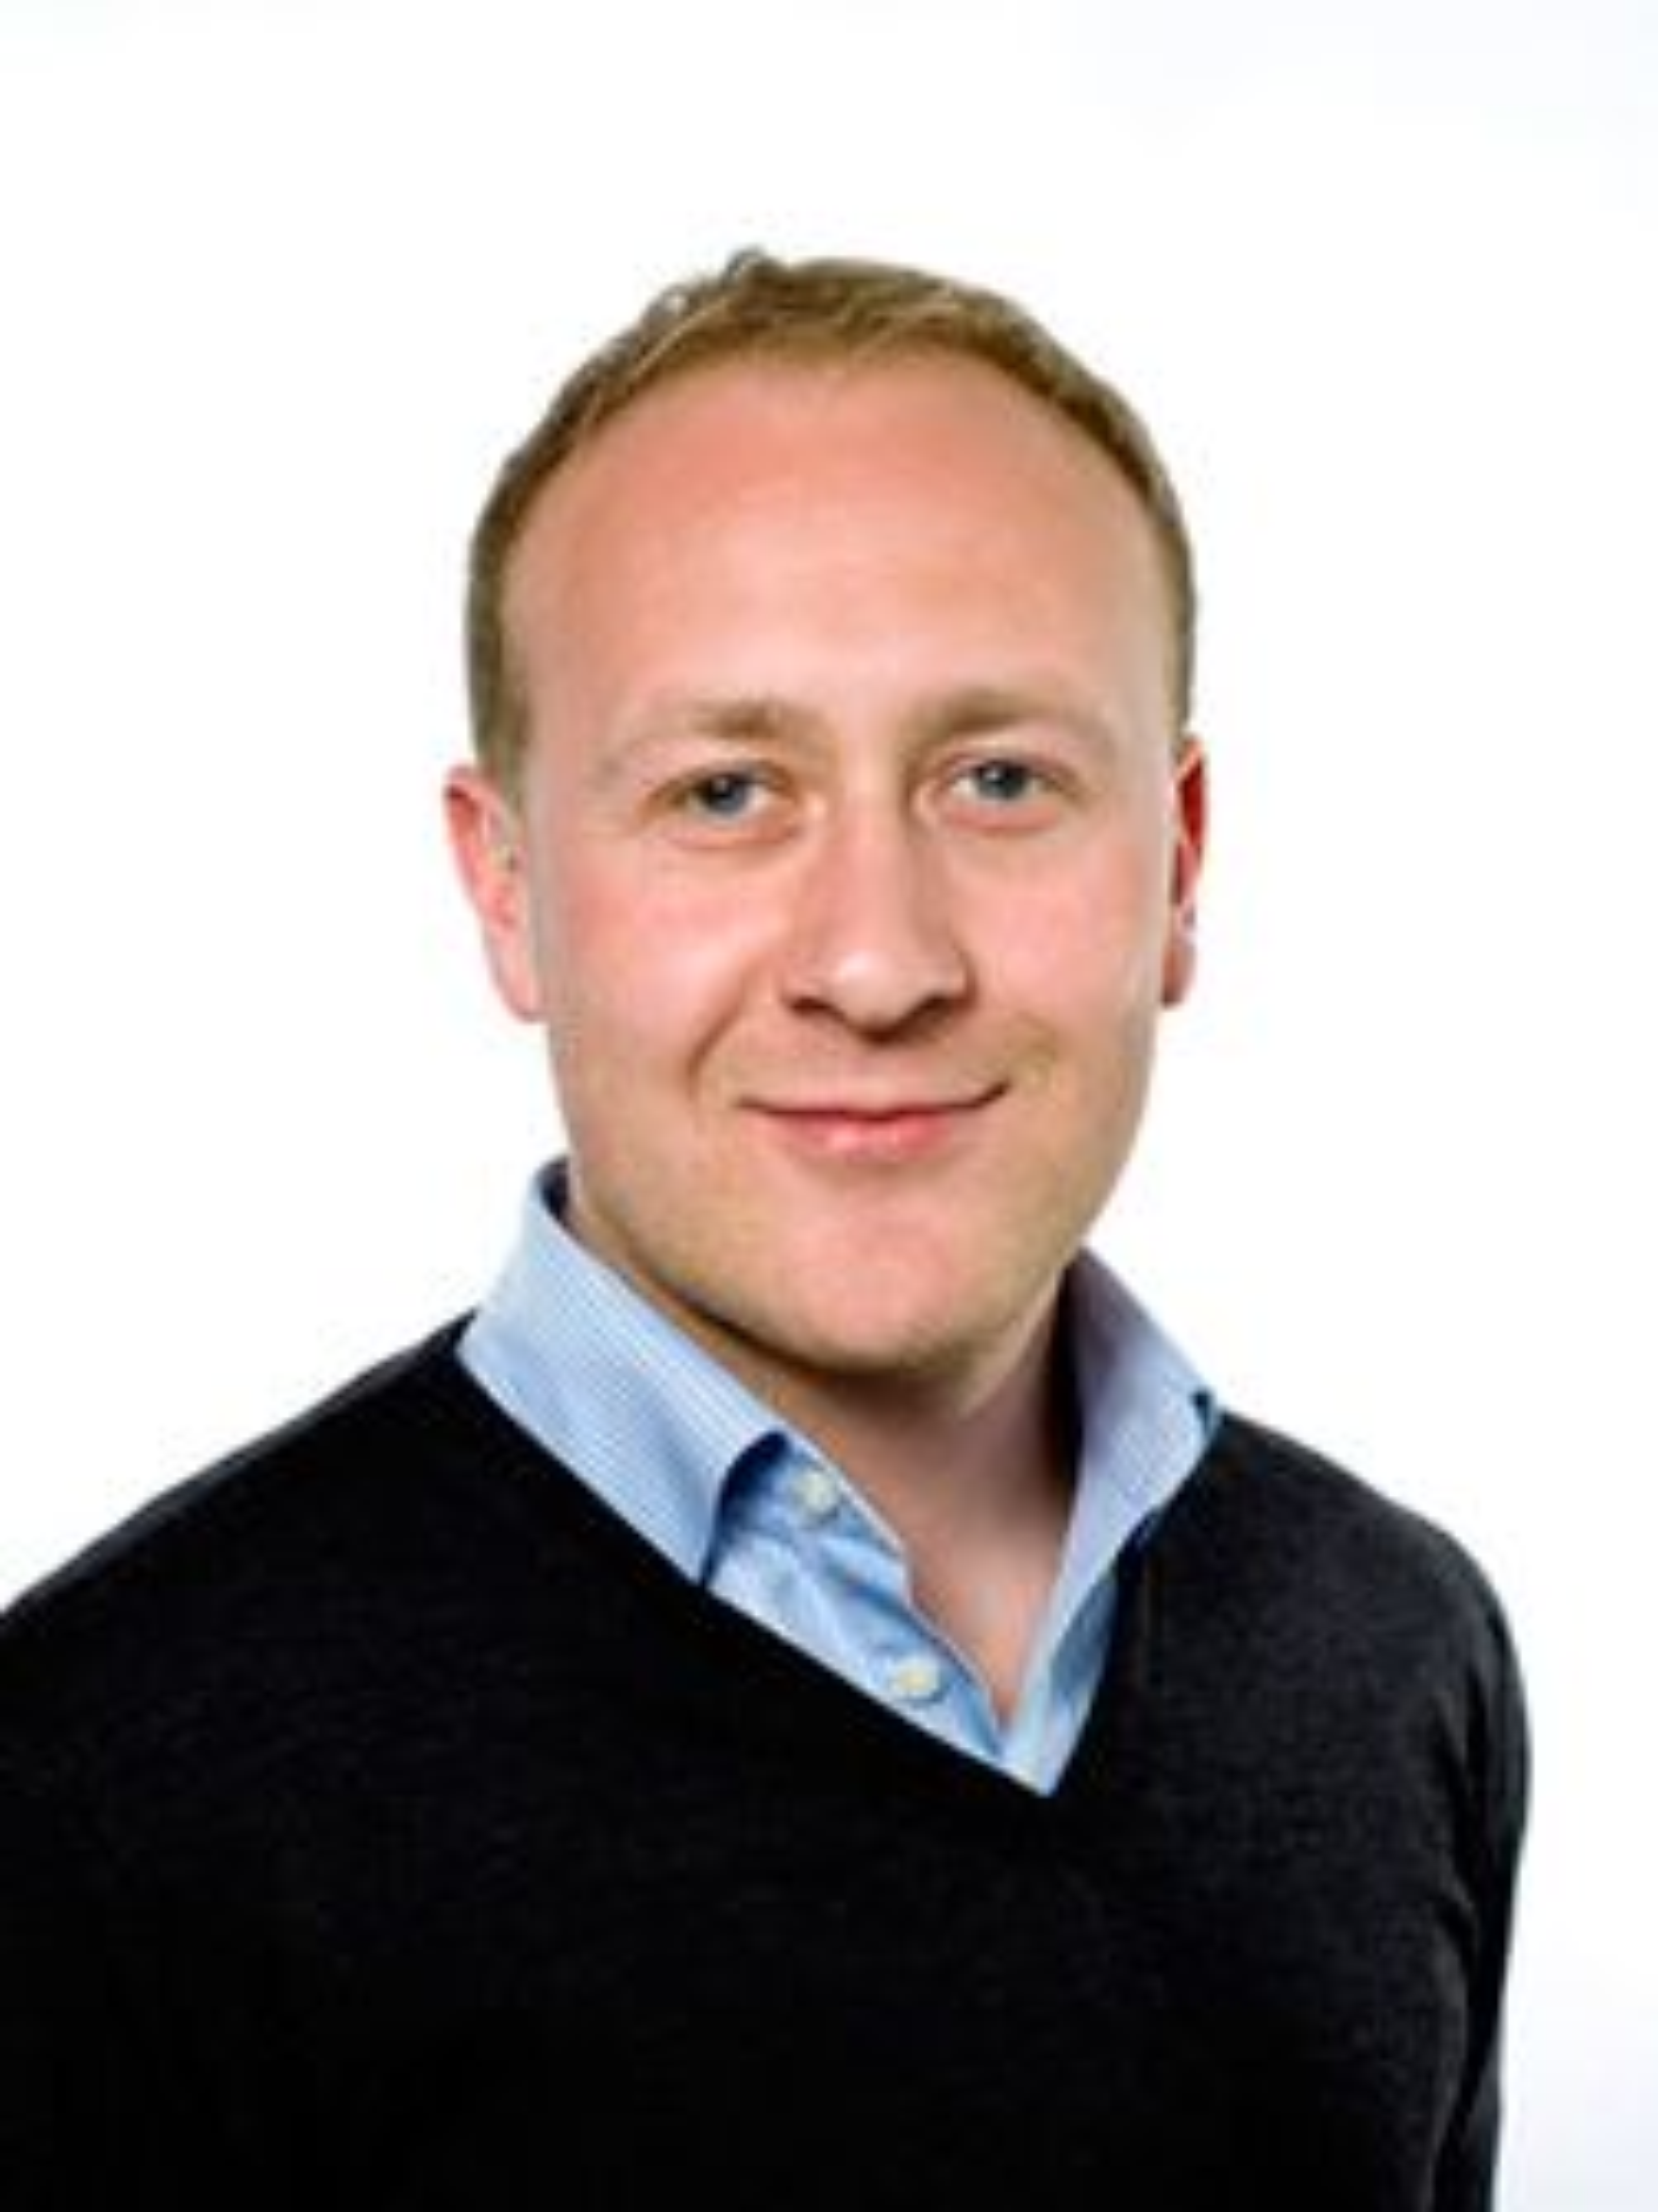 Øyvind Vederhus, kommunikasjonssjef i Netcom.